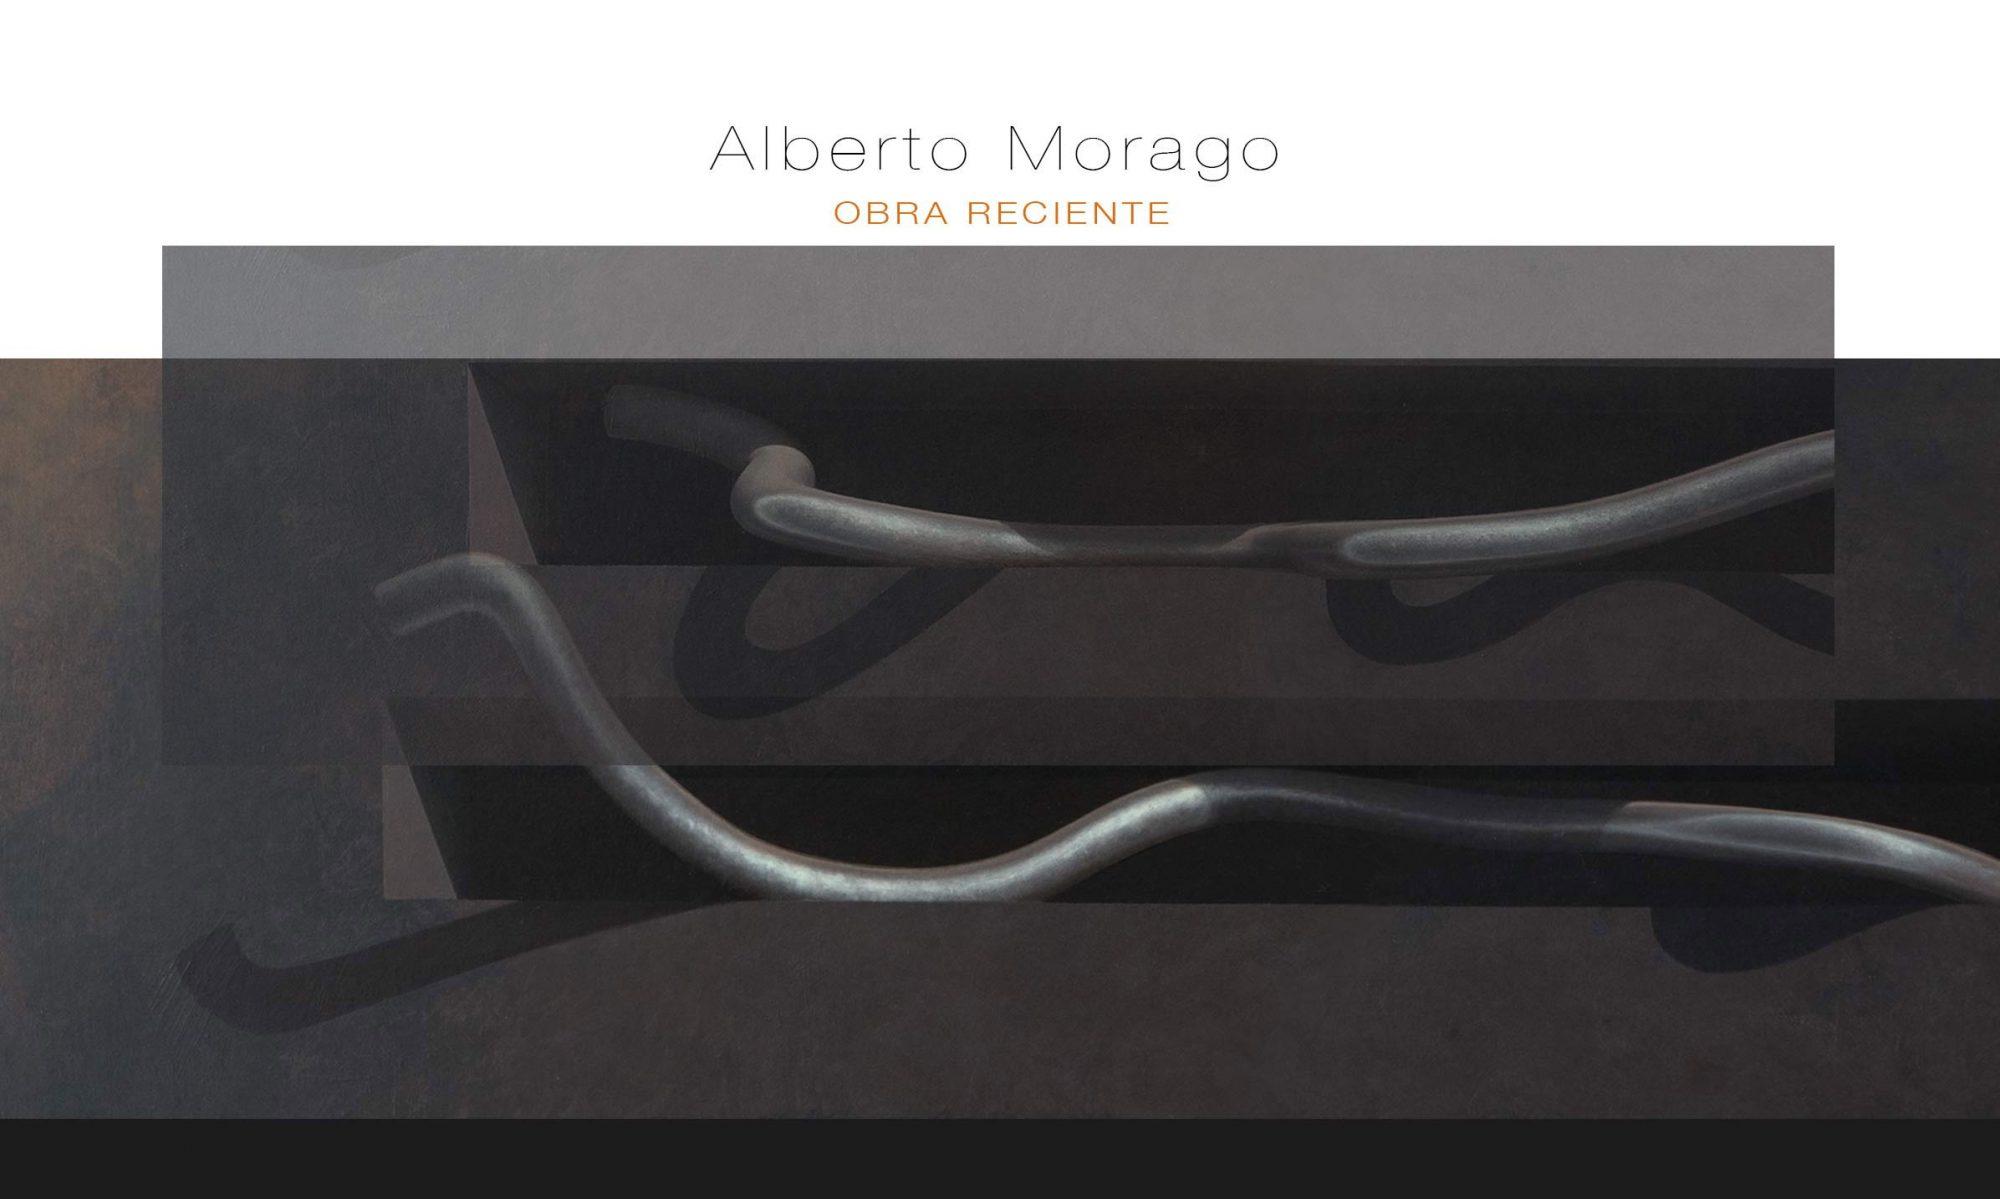 Alberto Morago